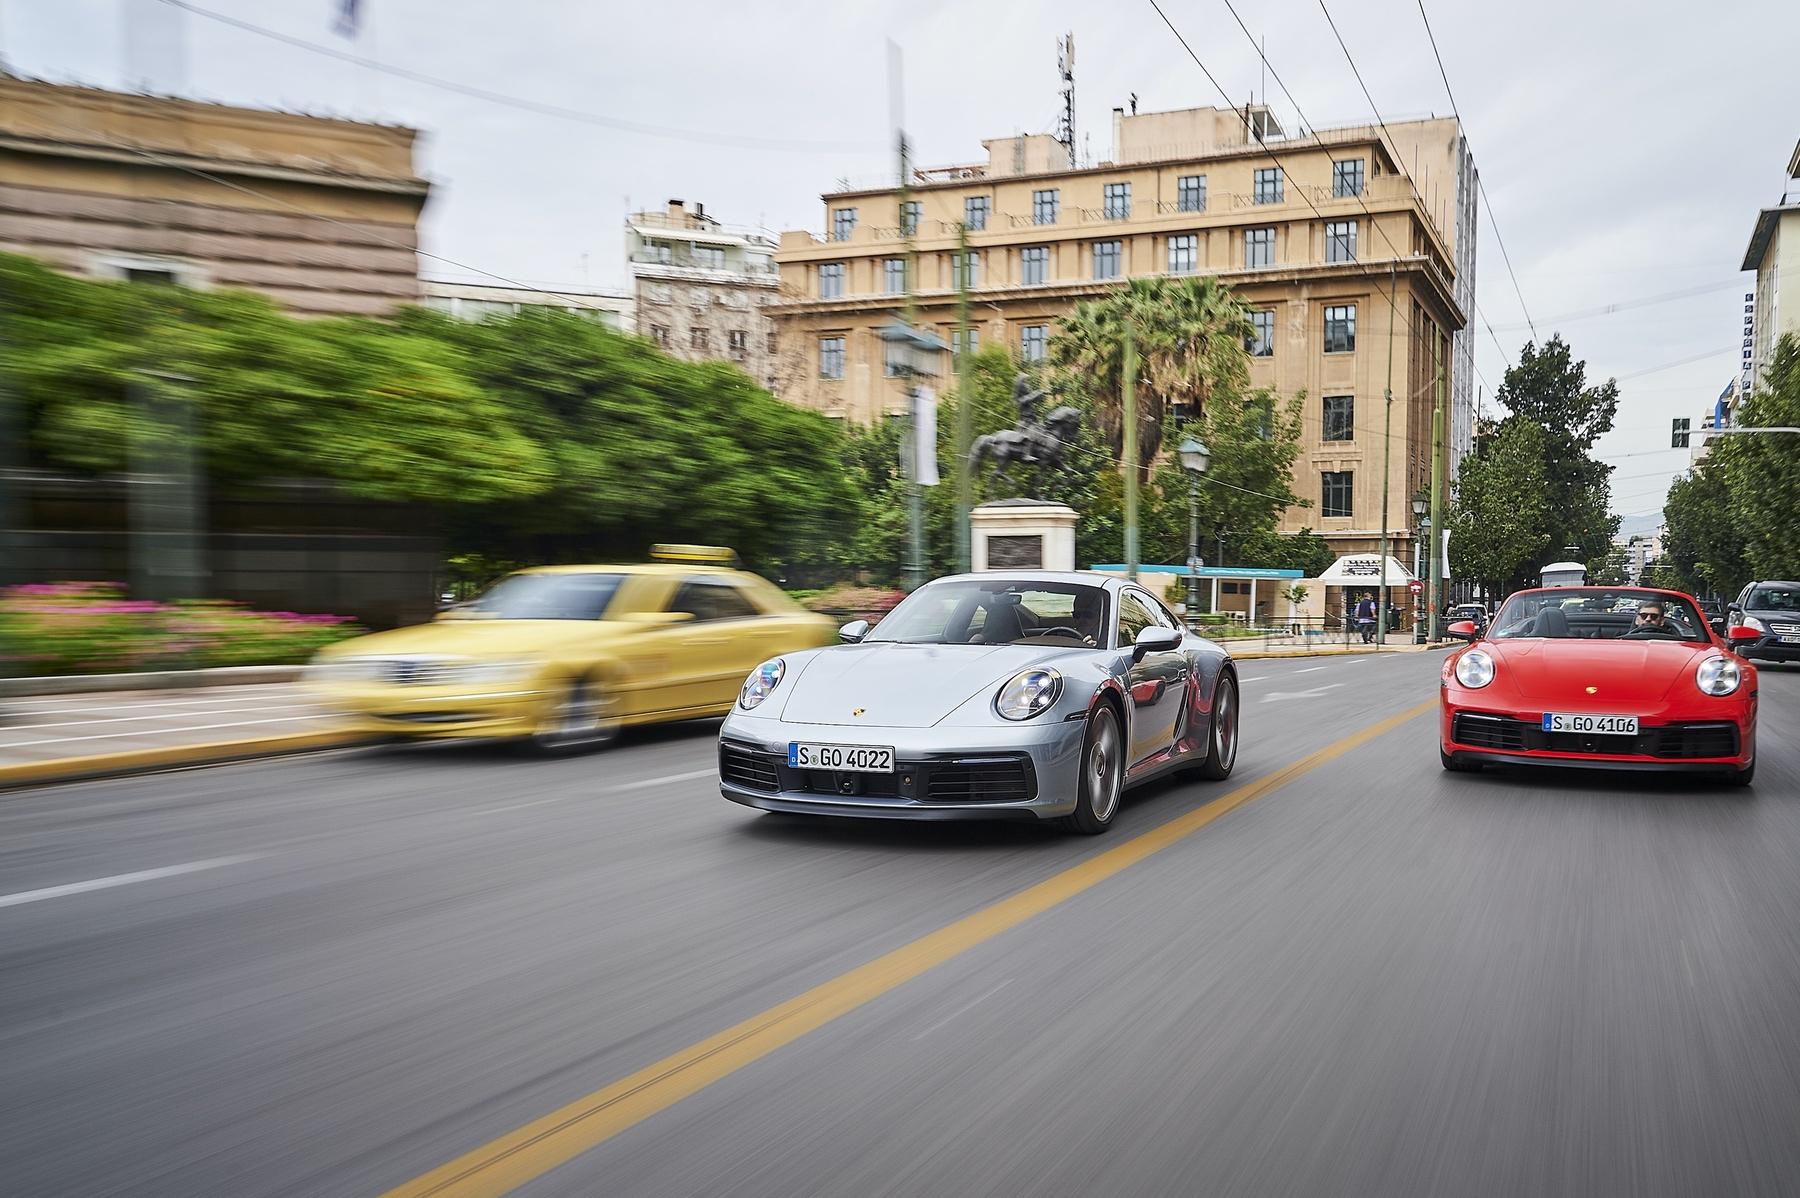 Test_Drive_Porsche_911_Athens_0187